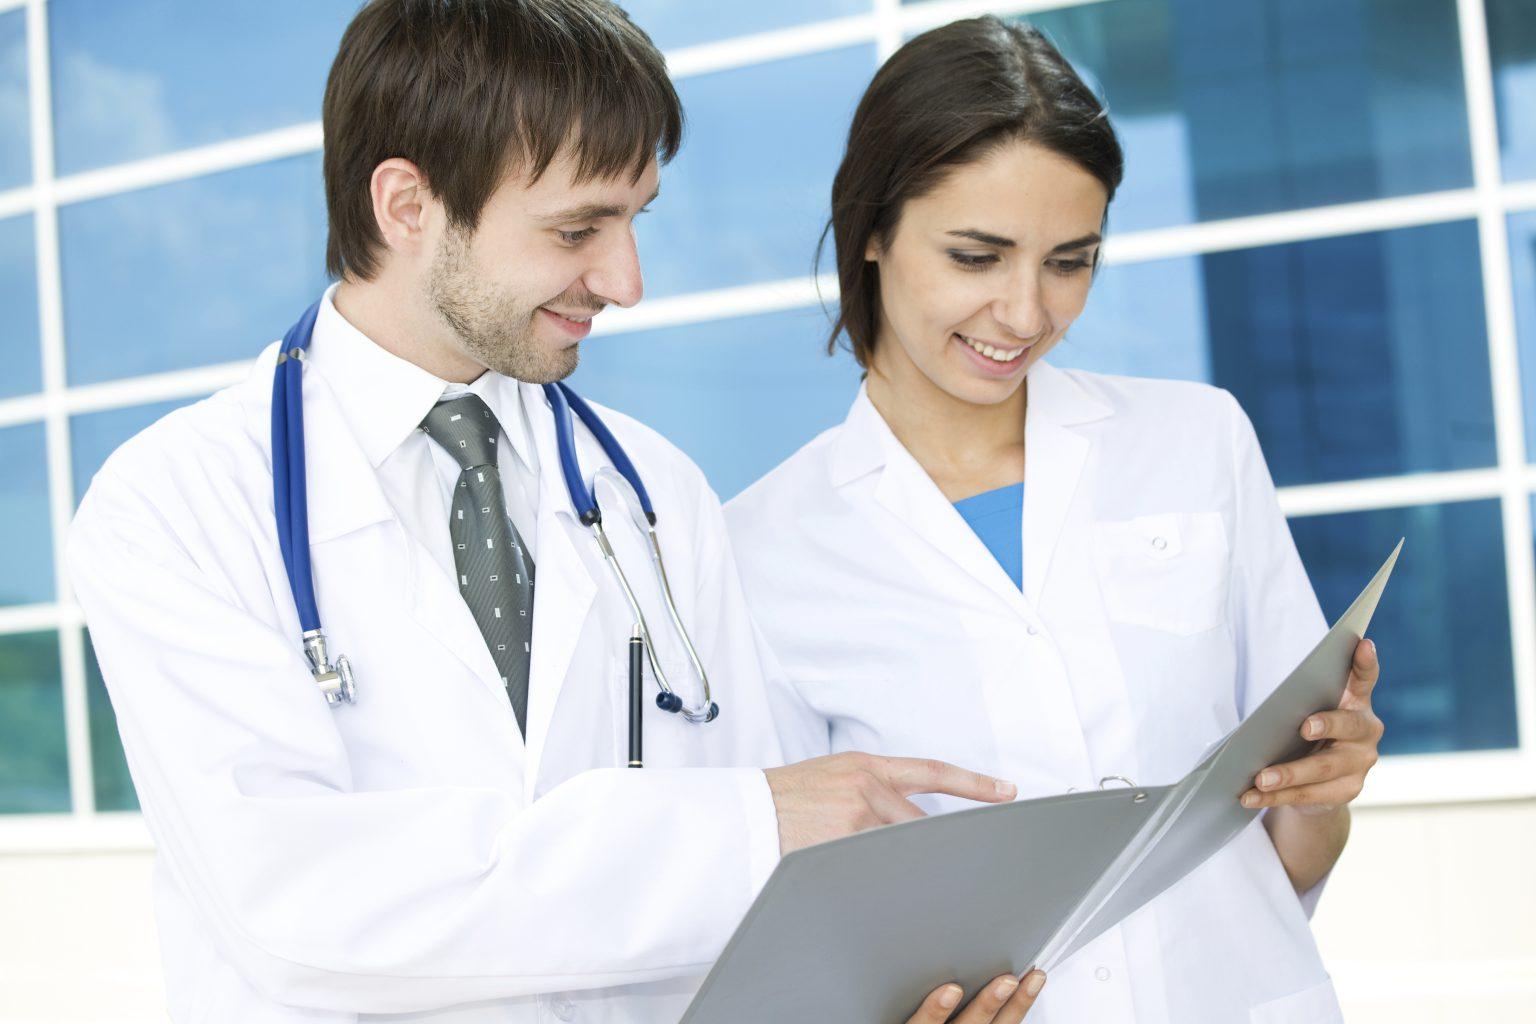 emploi medical